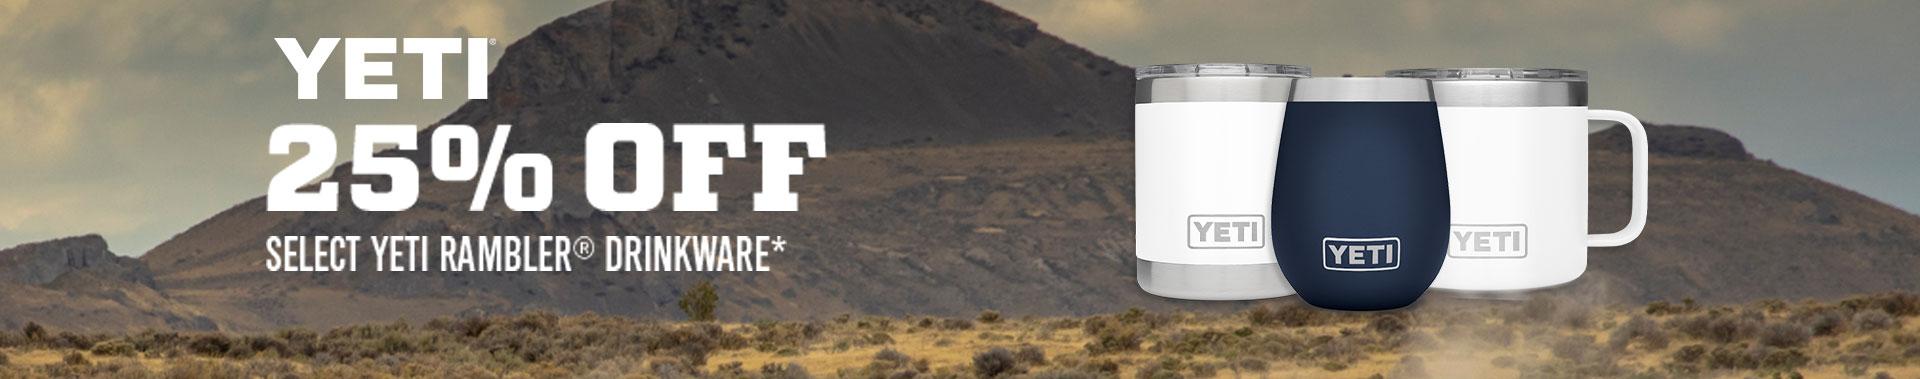 Yeti - 25% Off select Yeti Rambler Drinkware*